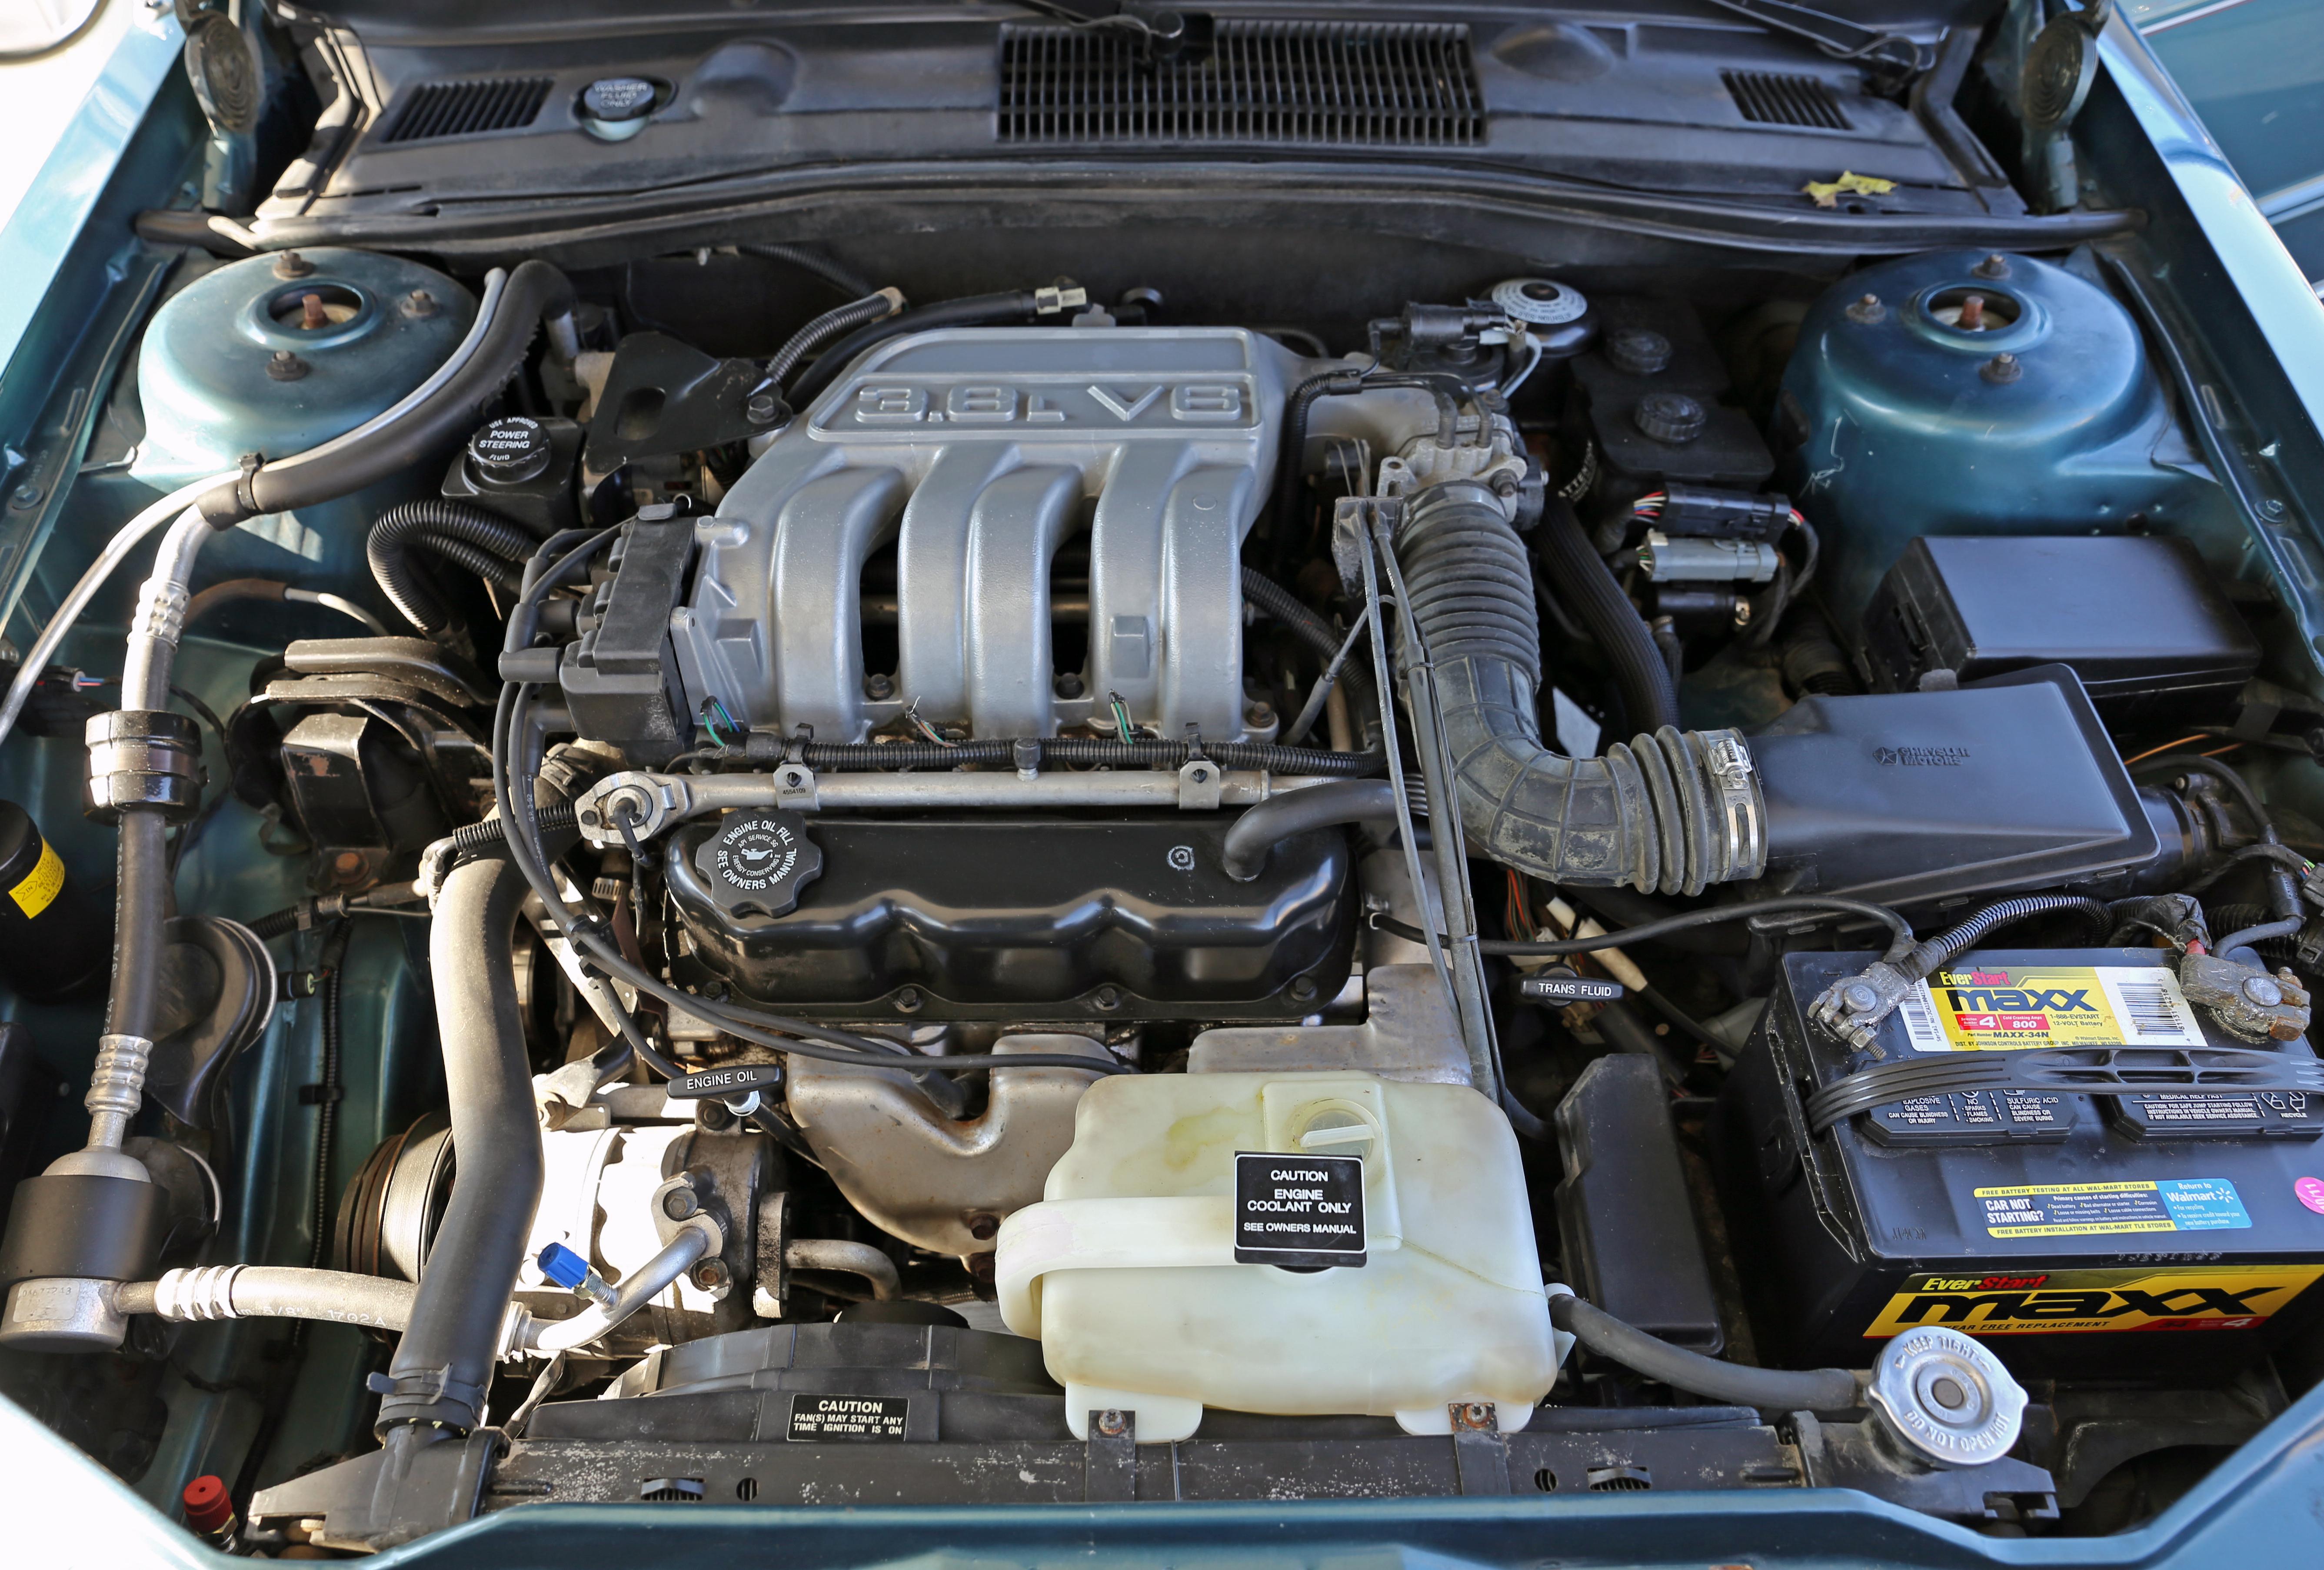 chrysler 3 3 & 3 8 engine wikiwand engine head bolt torque chrysler 3.2 engine diagram #26